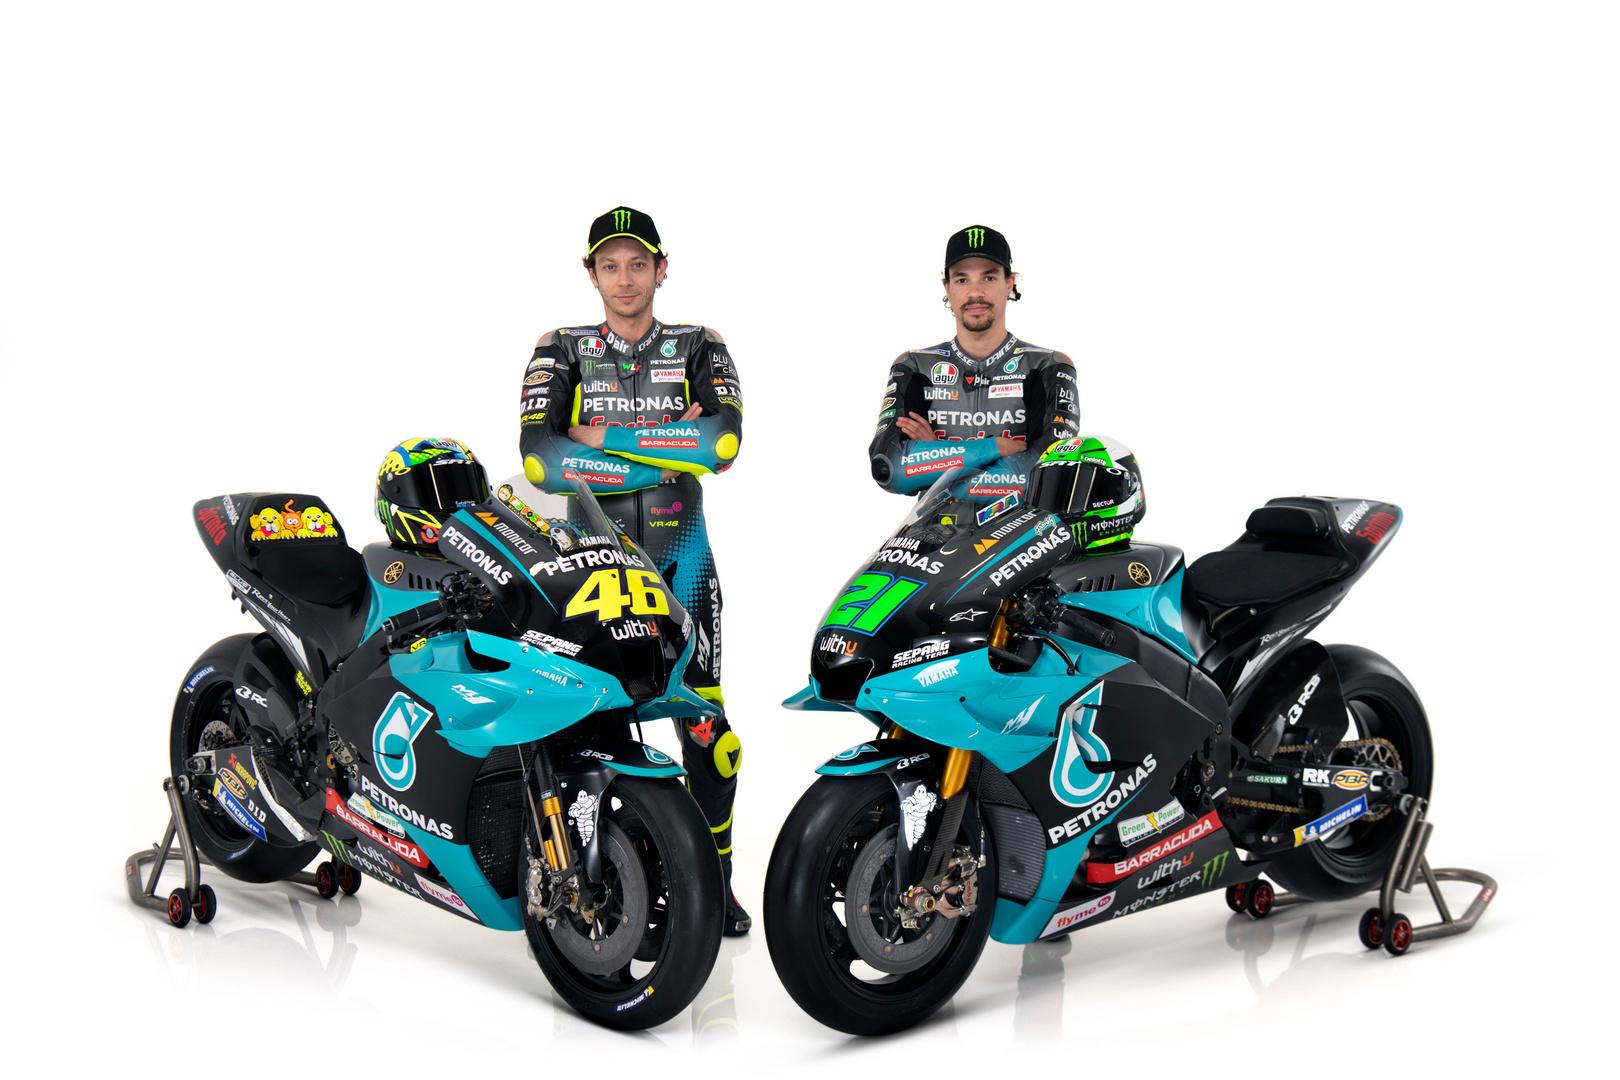 Yamaha Petronas Rossi Morbidelli